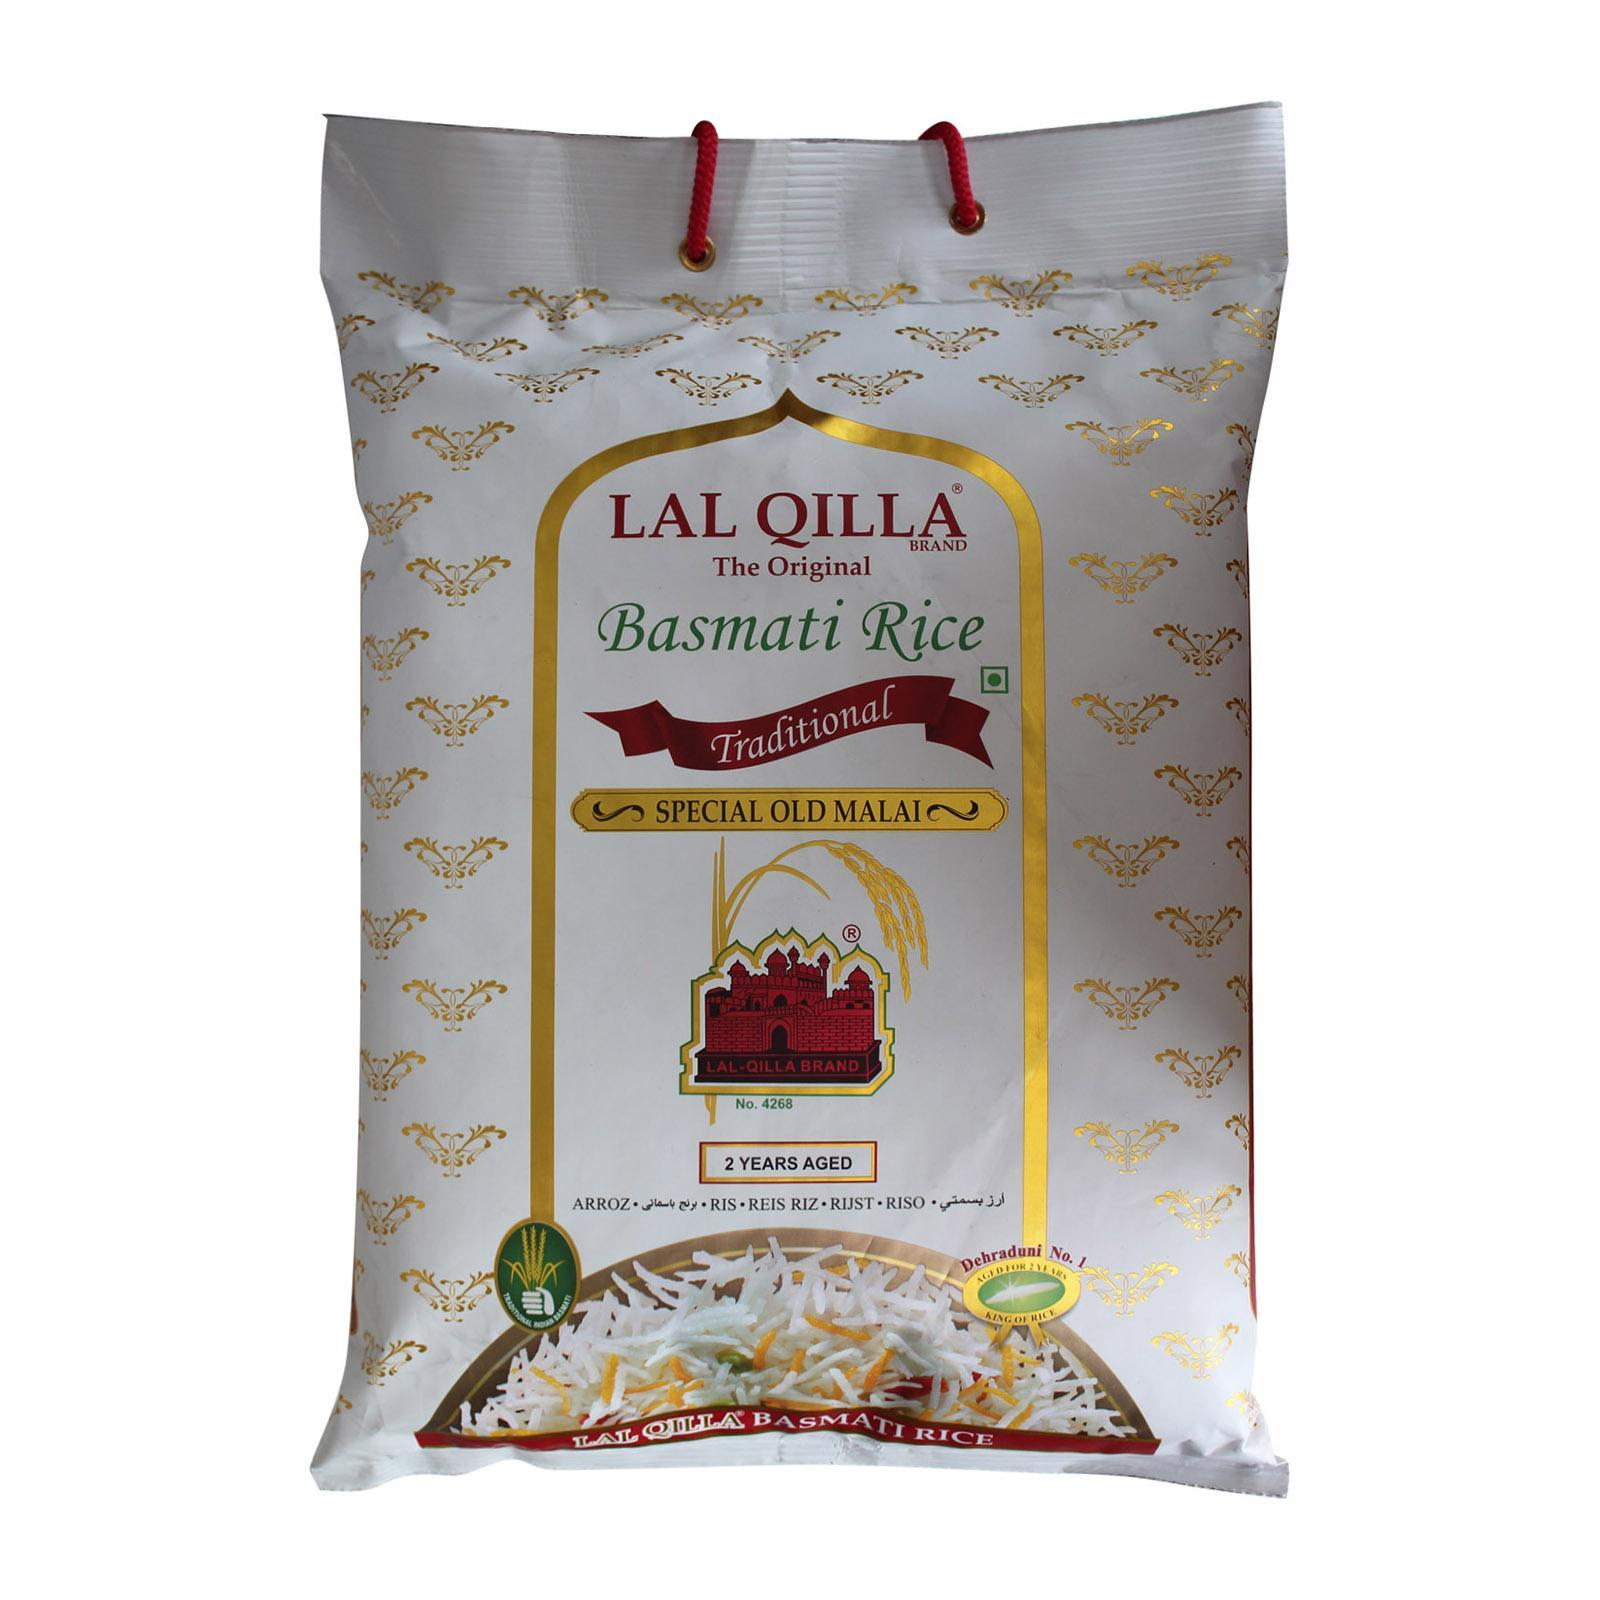 Lal Qilla Basmati Rice - By Dashmesh